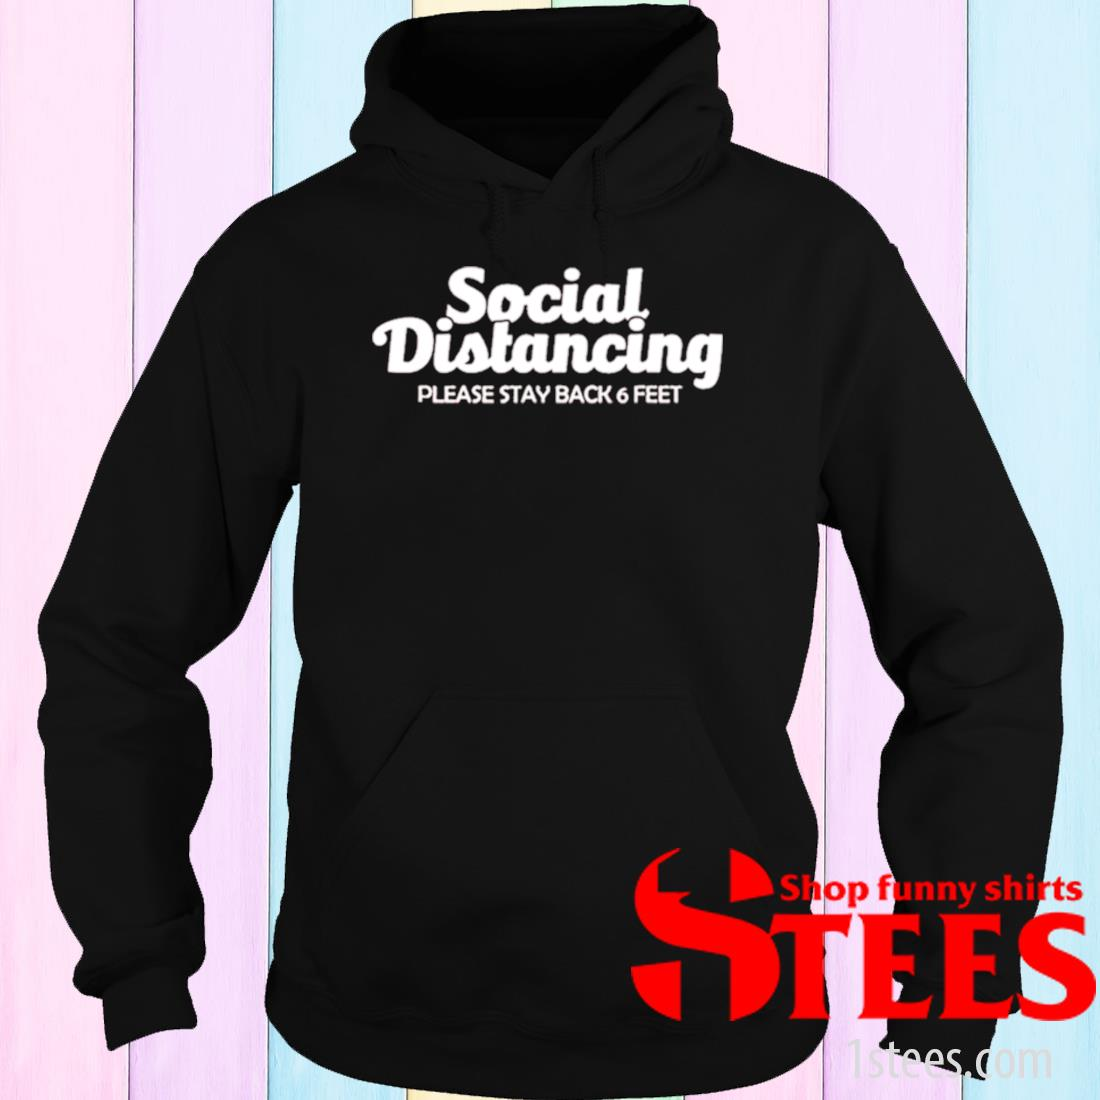 Social Distancing Please Stay Back 6 Feet Anti Social Shirt hoodie